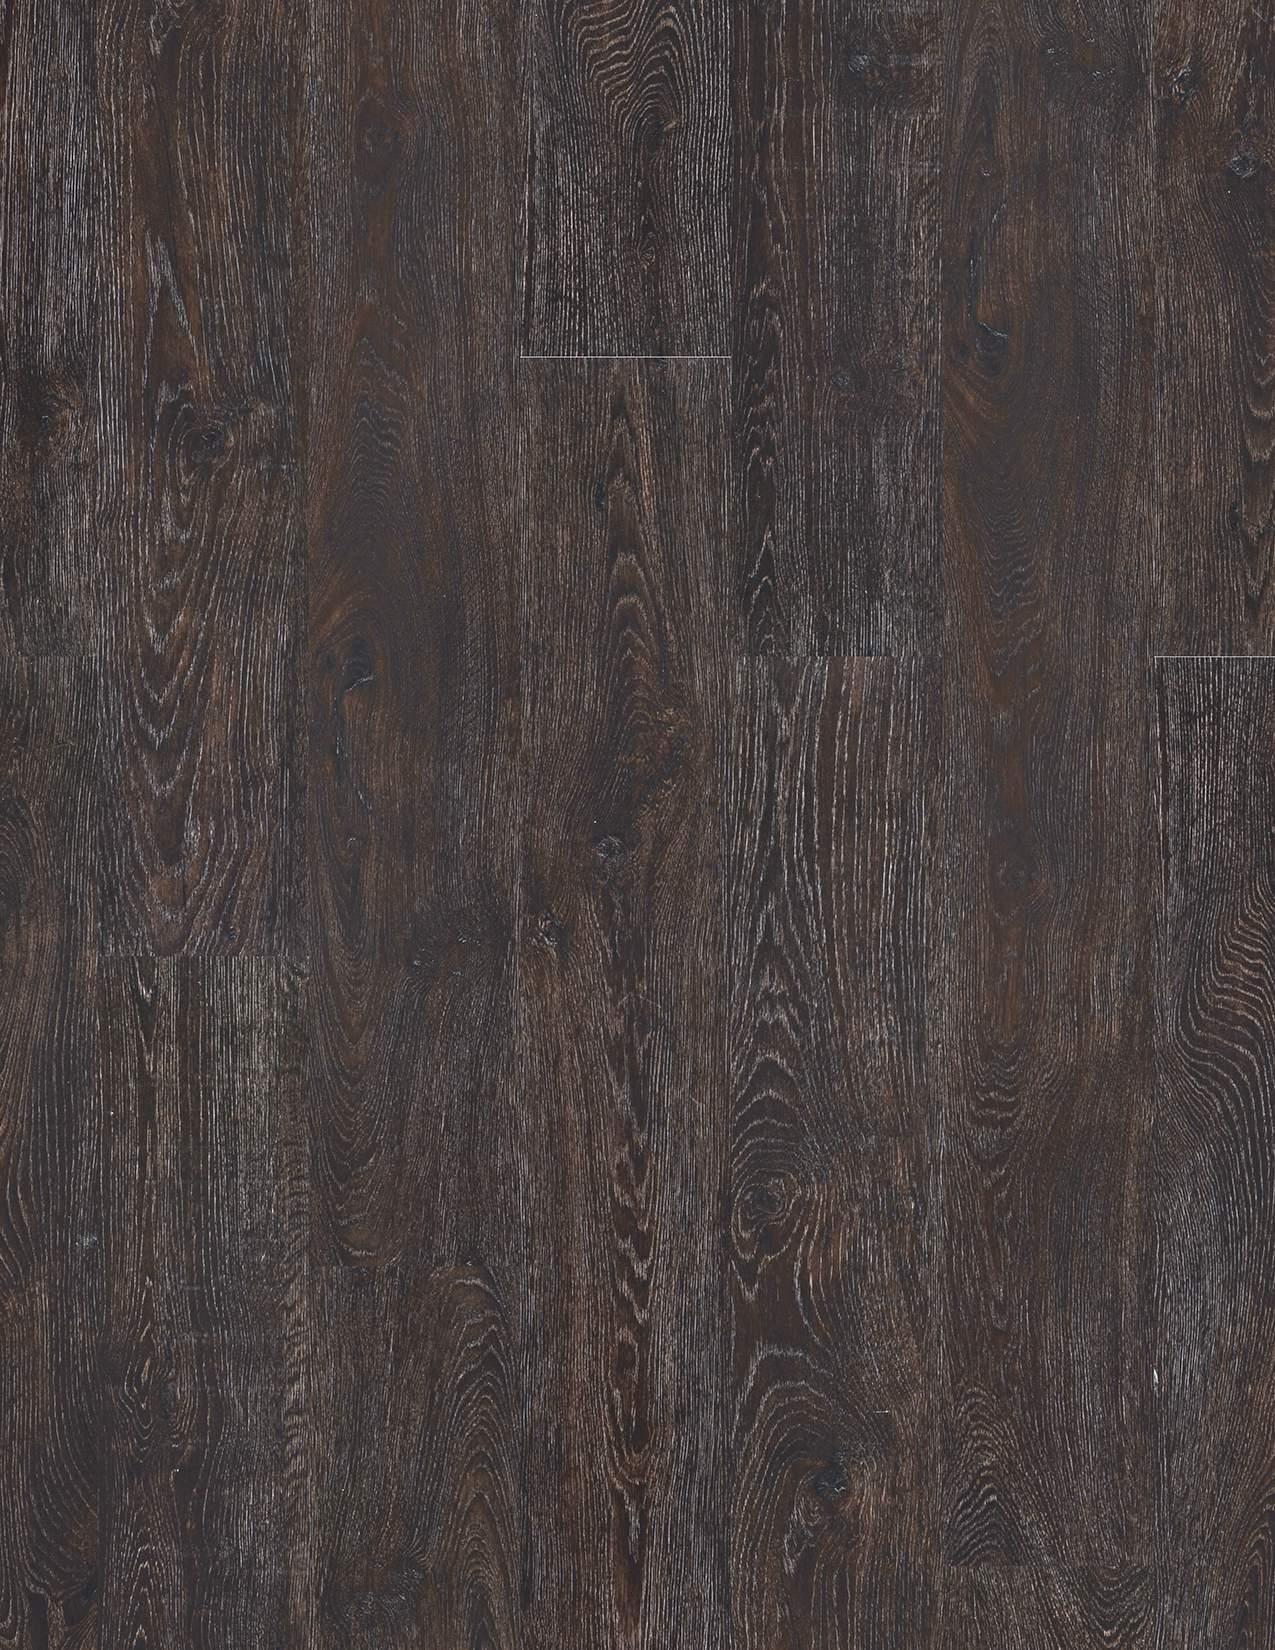 banff oak 50 LVR 9603